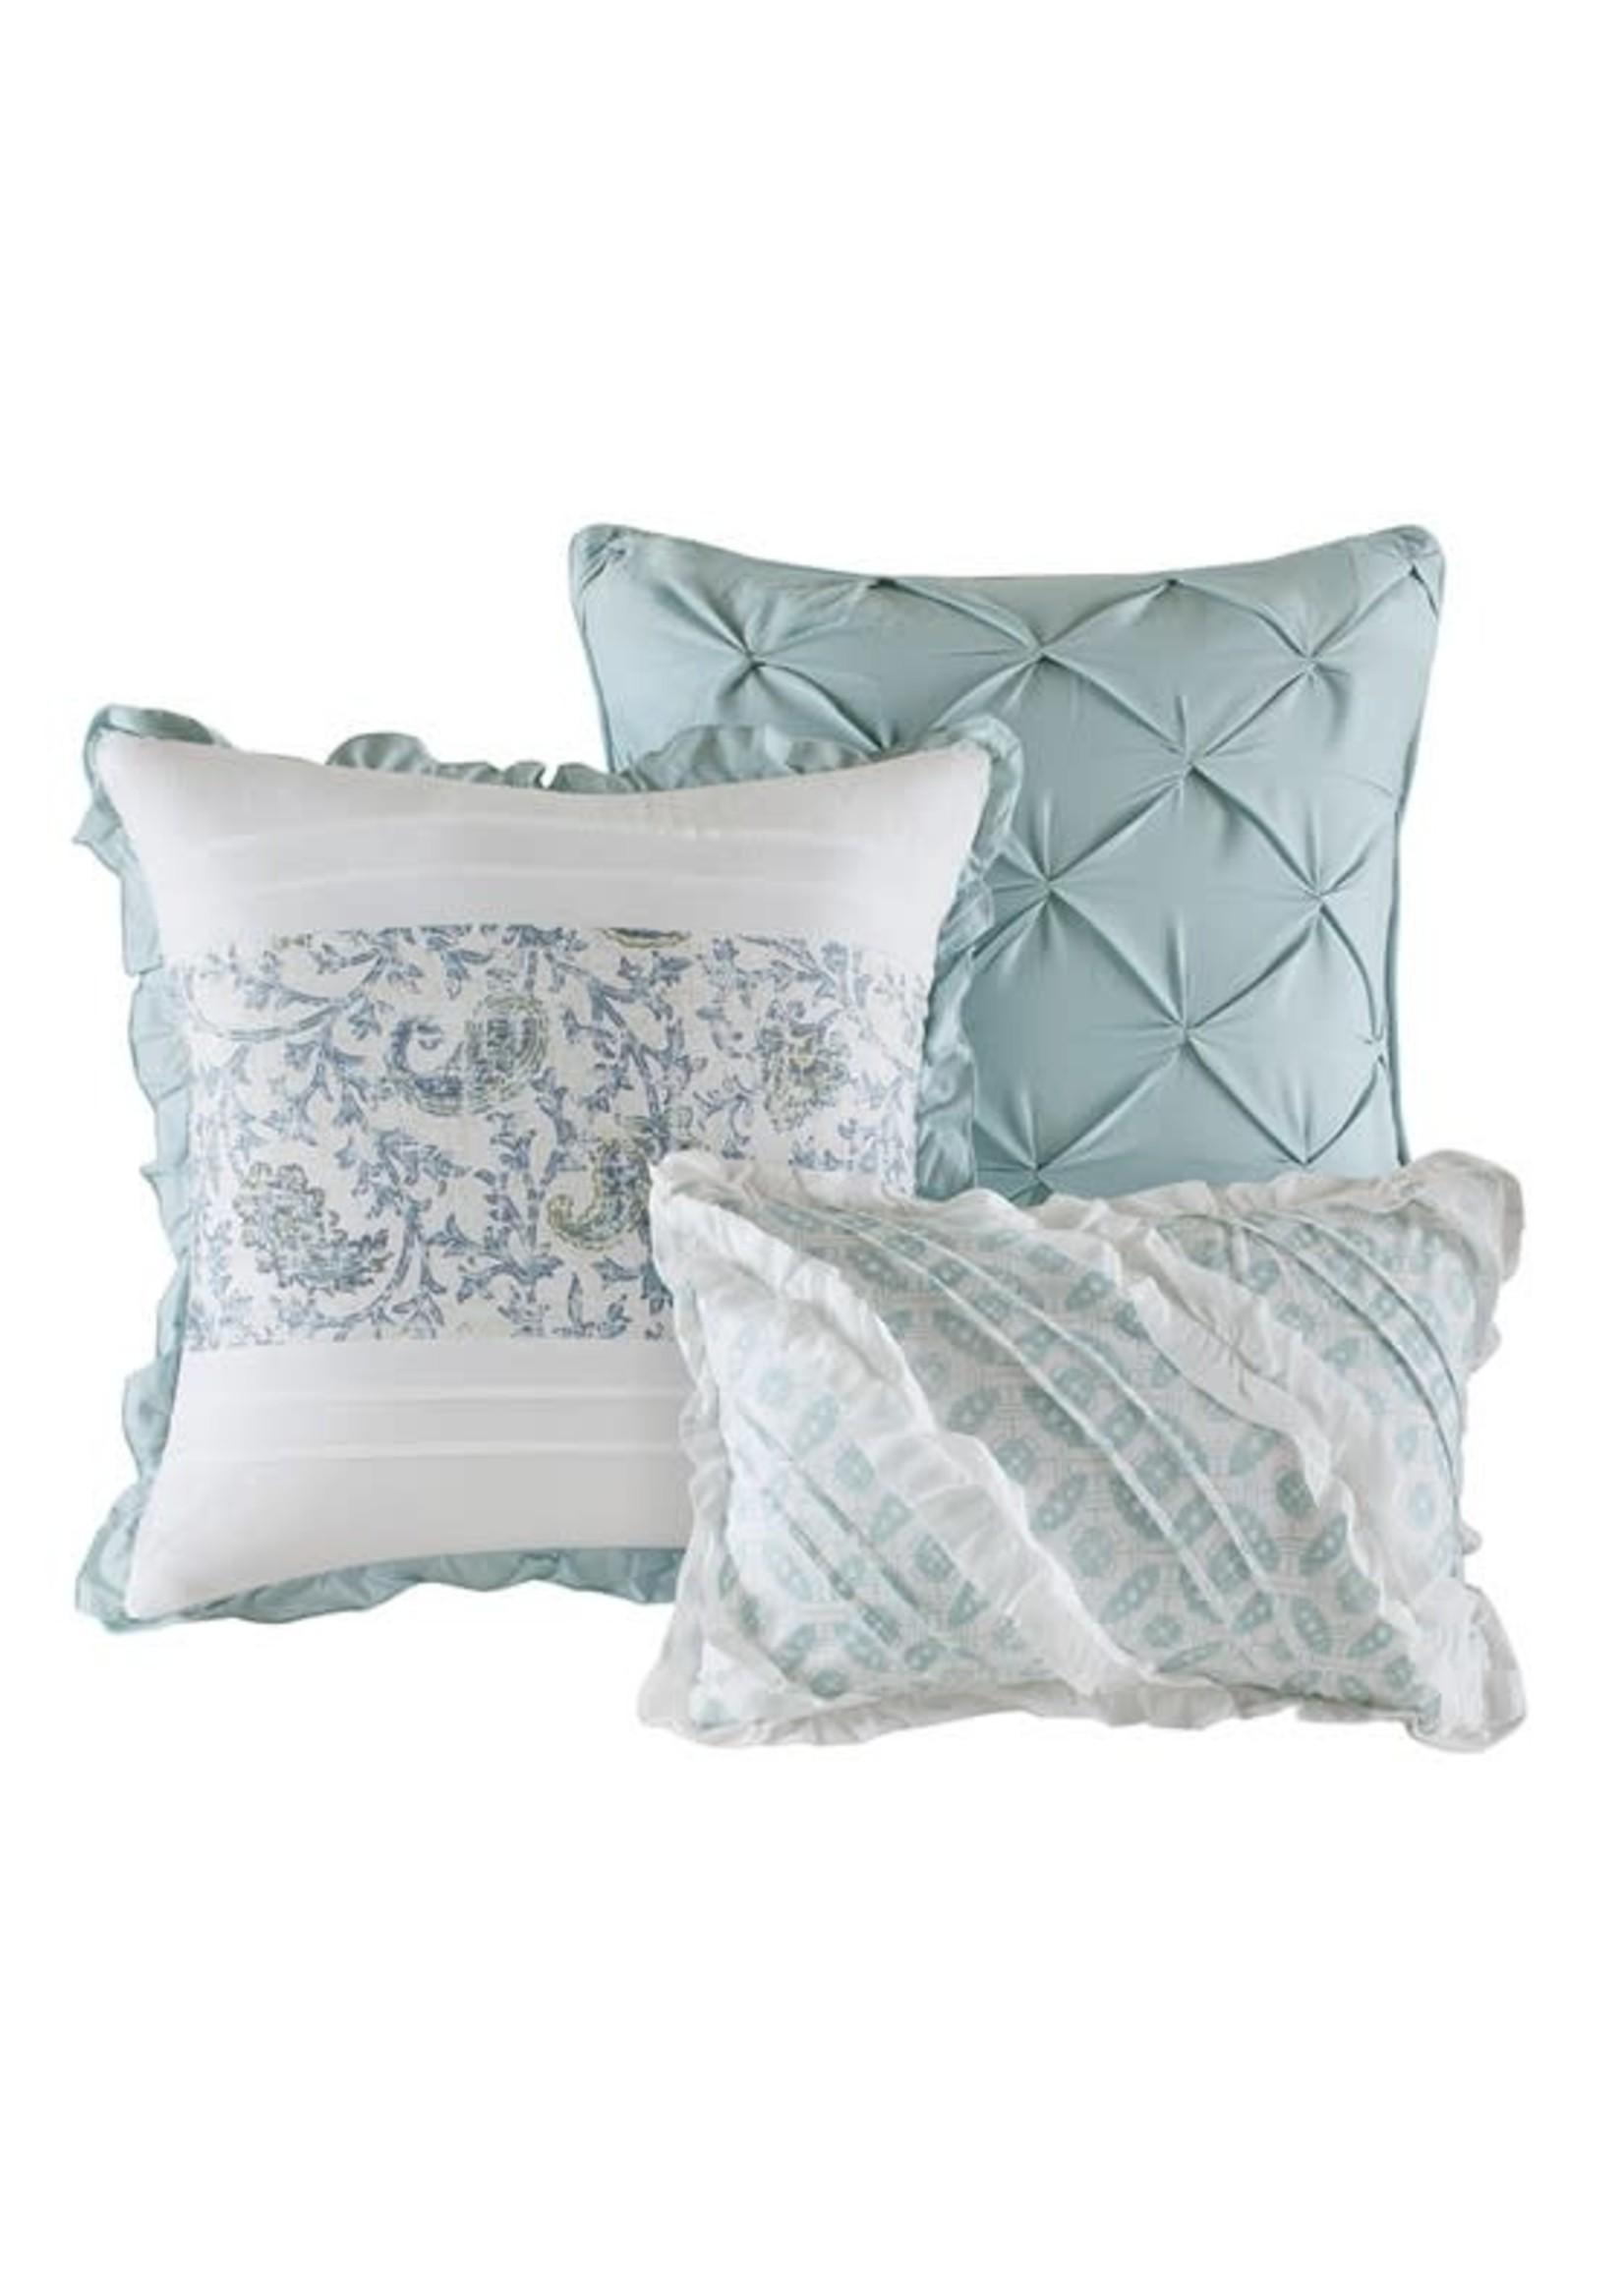 Olliix OLLIIX Dawn 6pc Cotton Percale Rev Coverlet Set Blue KING